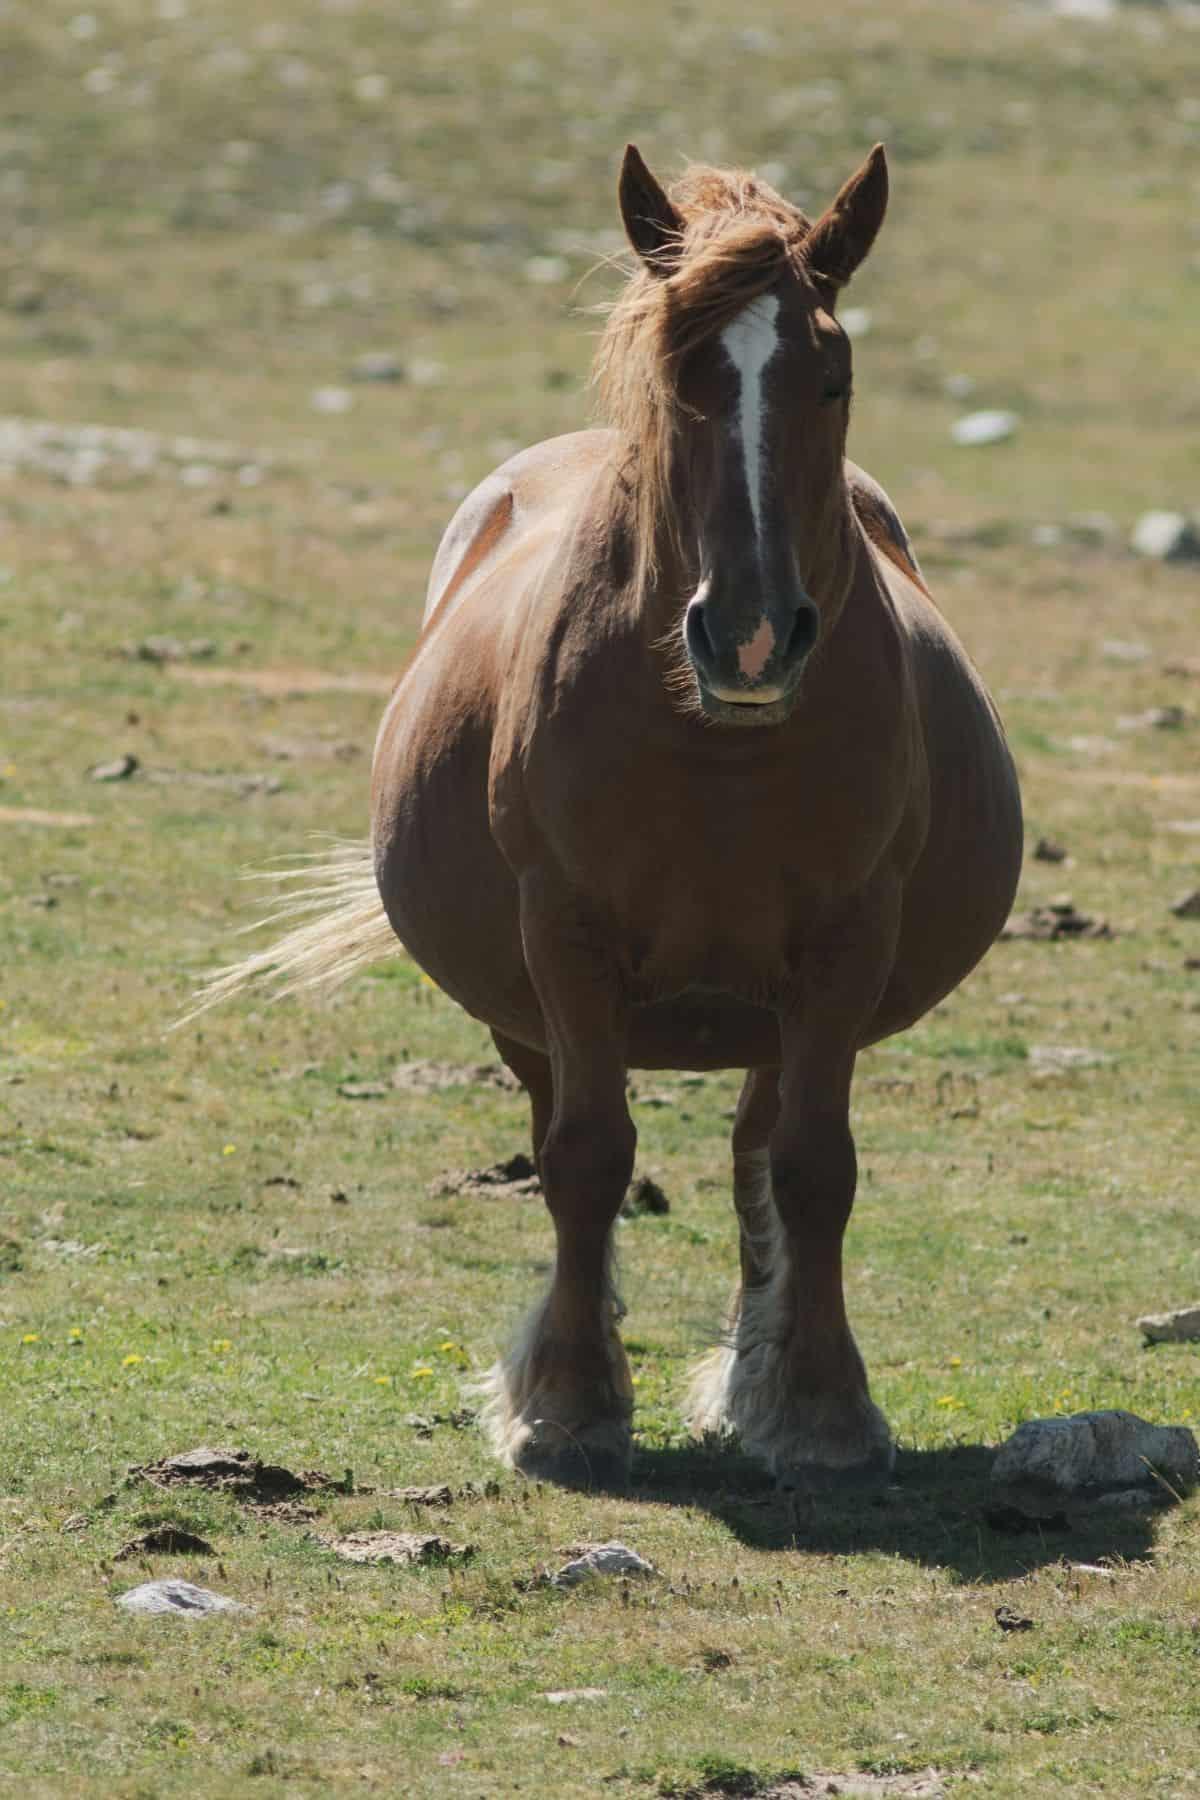 Pregnant horse trotting toward front ofi mage